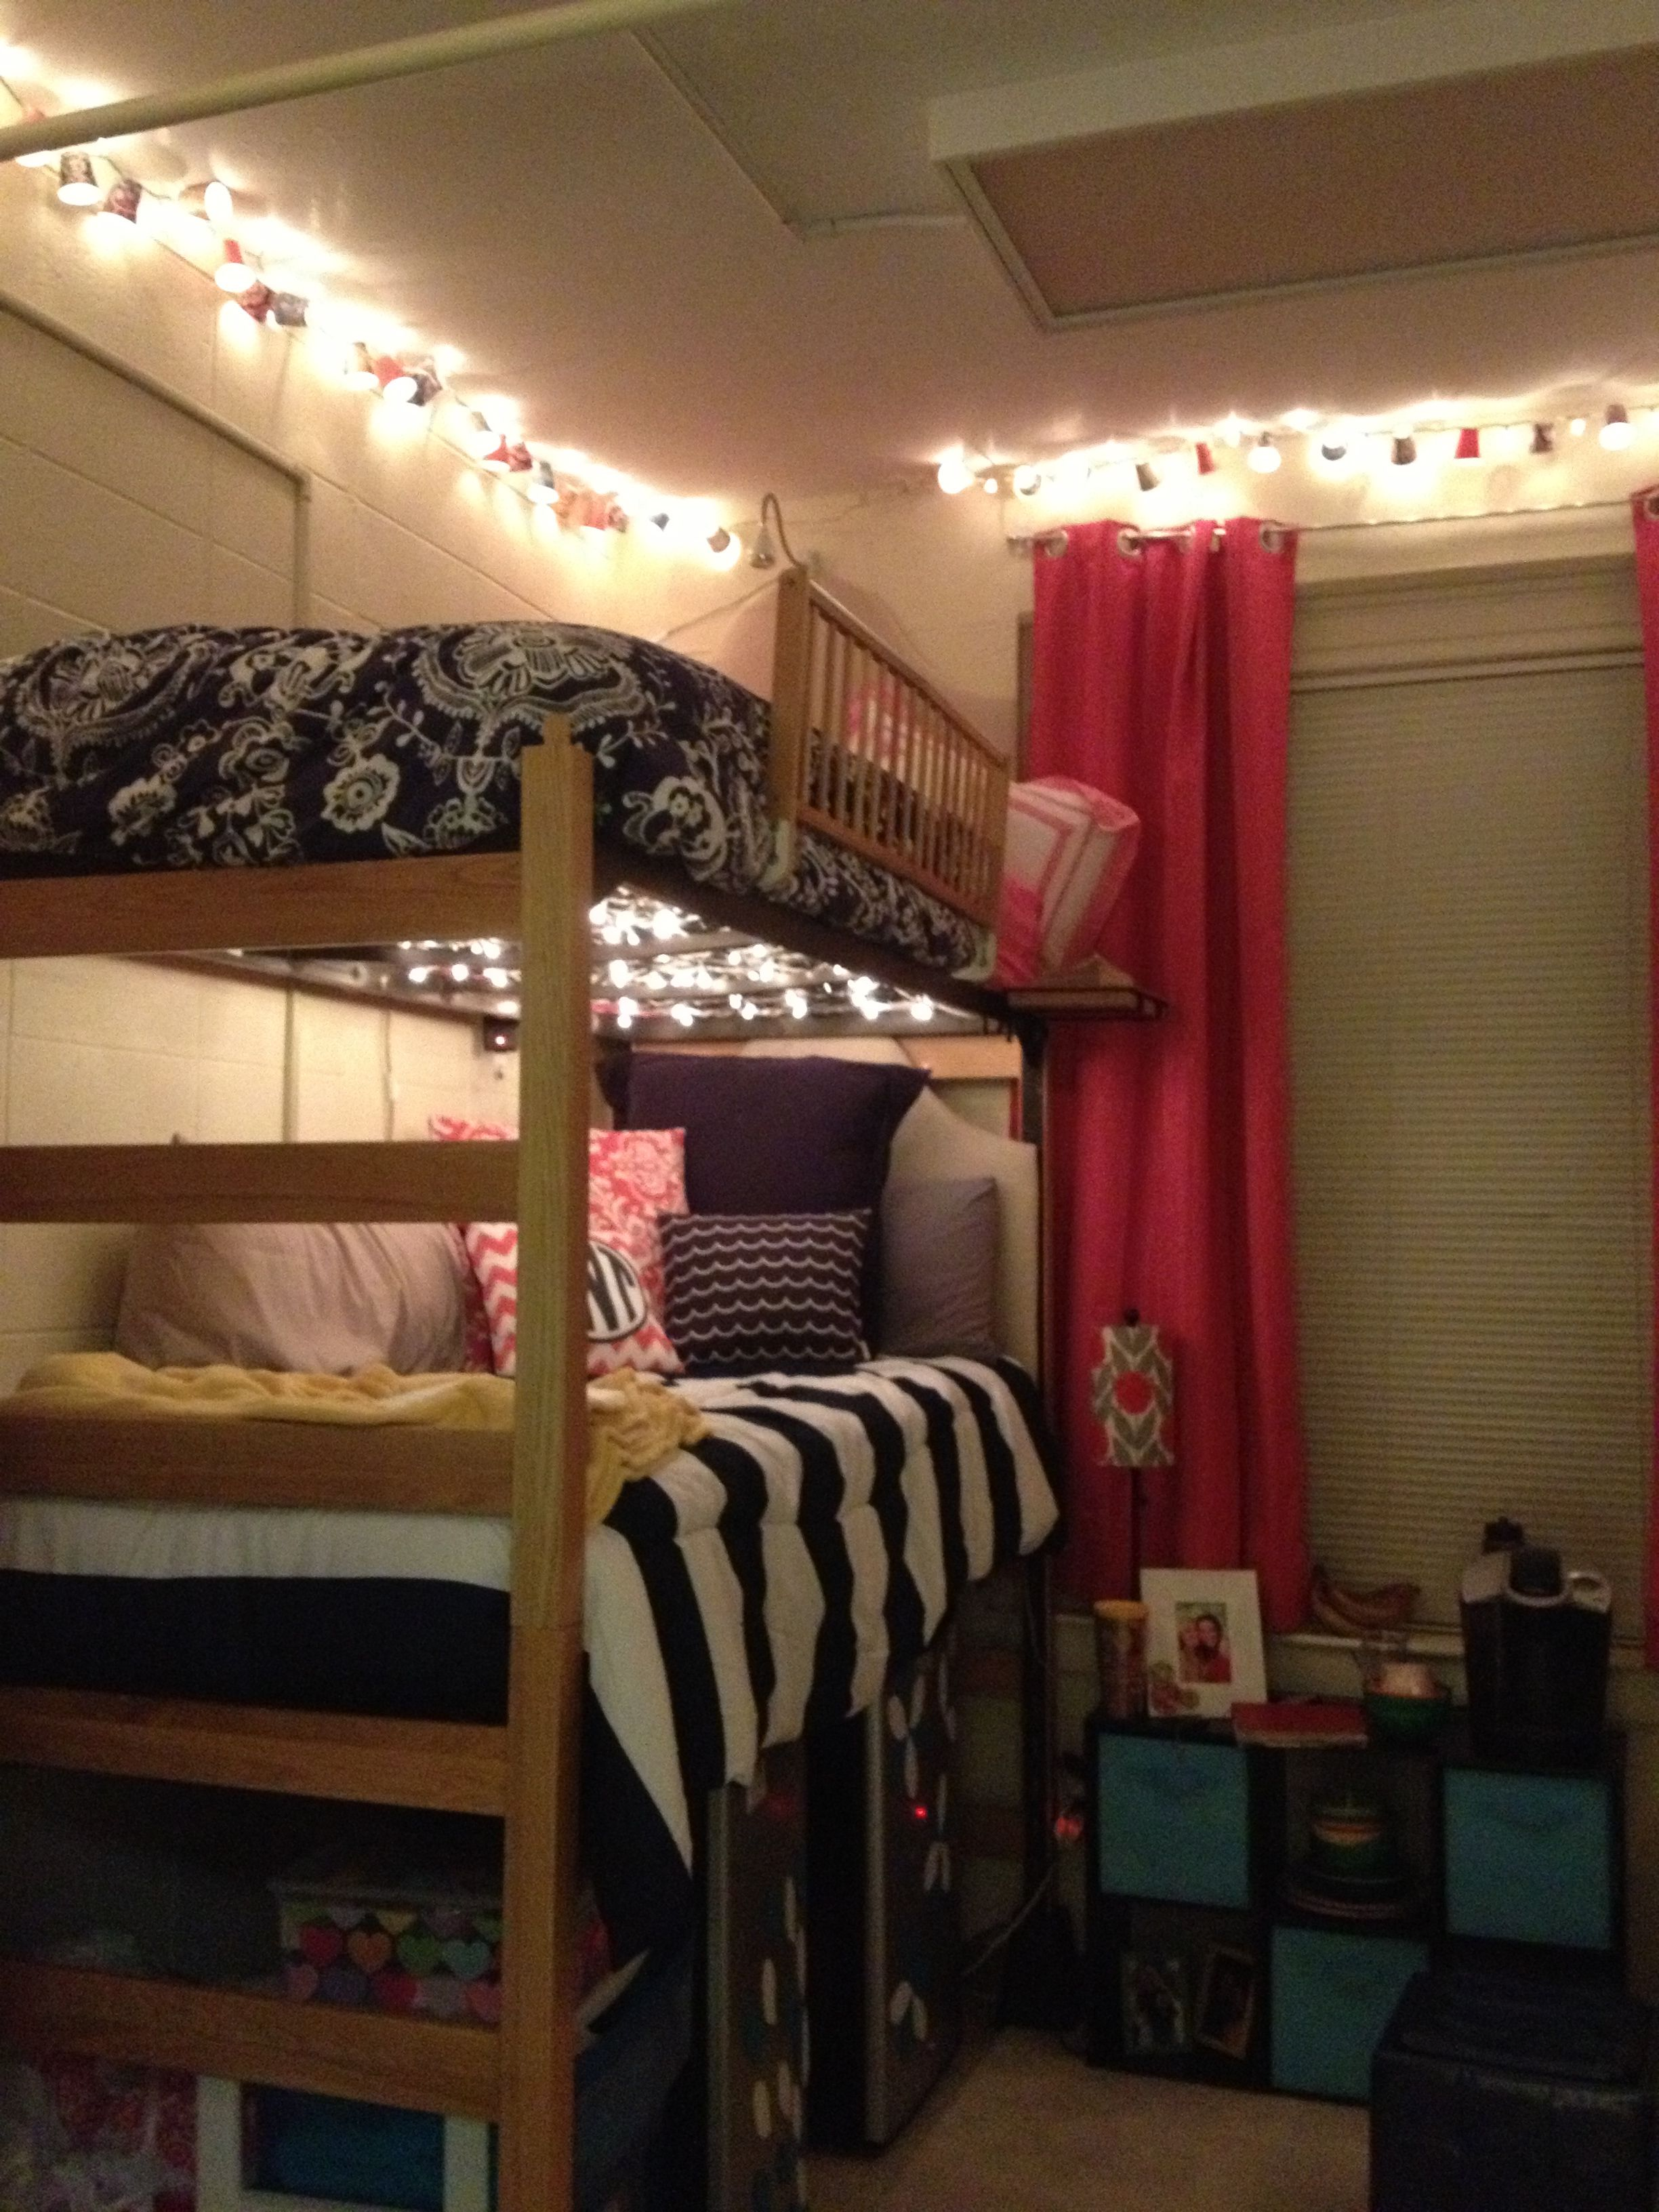 Dorm Room Loft Beds: Cozy Dorm Room, Dorm Bunk Beds, College